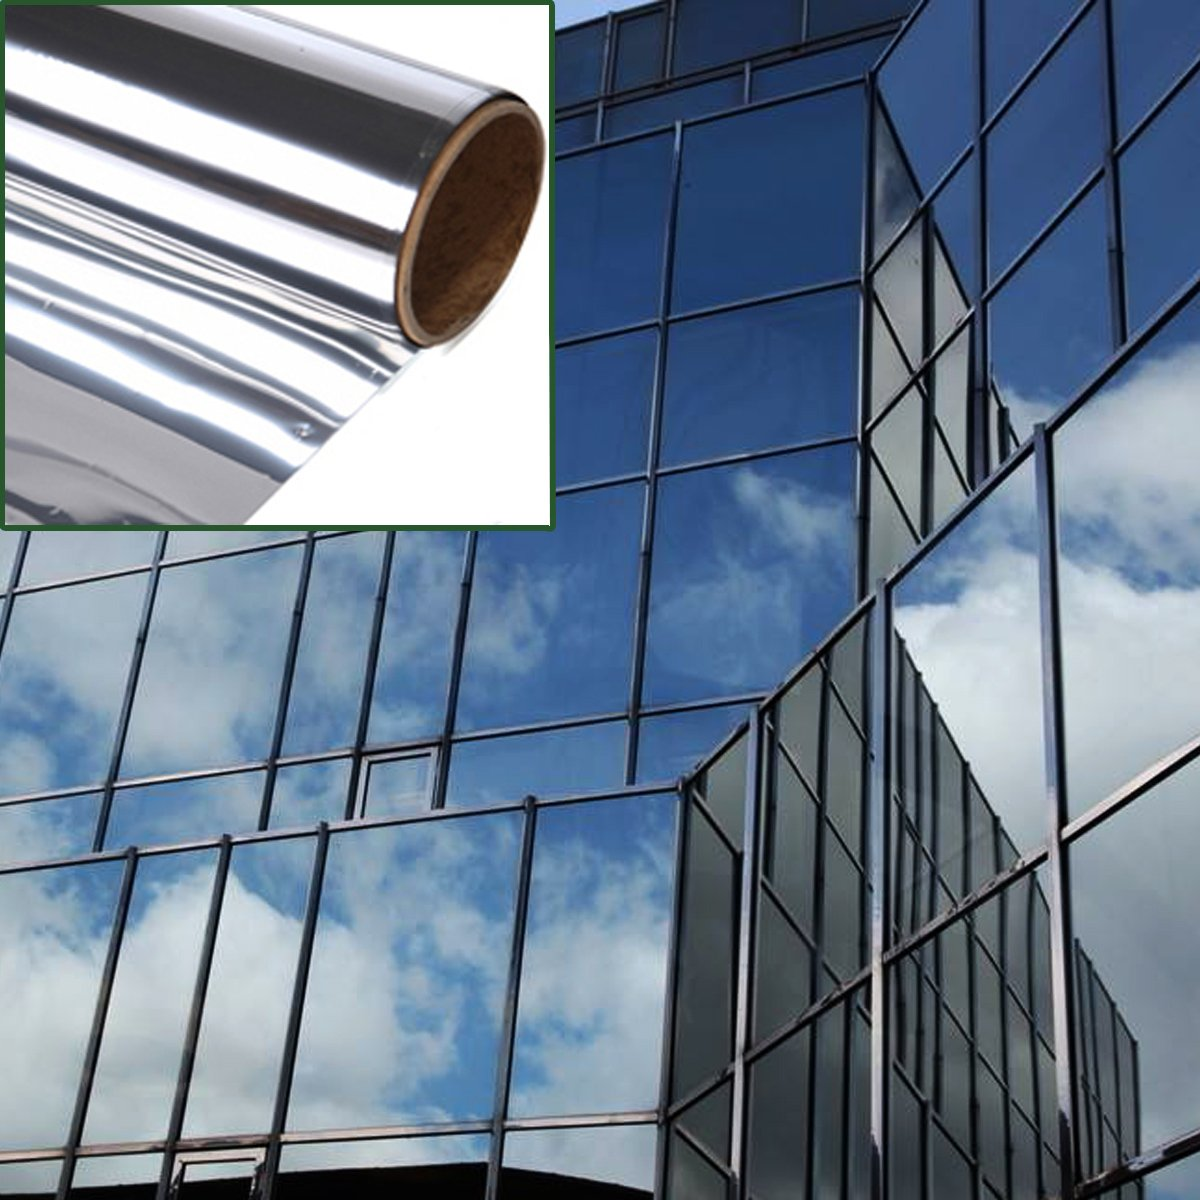 Silver Aissimio Silver Solar Reflective Window Film Paper Insulation Stickers One Way Mirror 60cm*1.8m